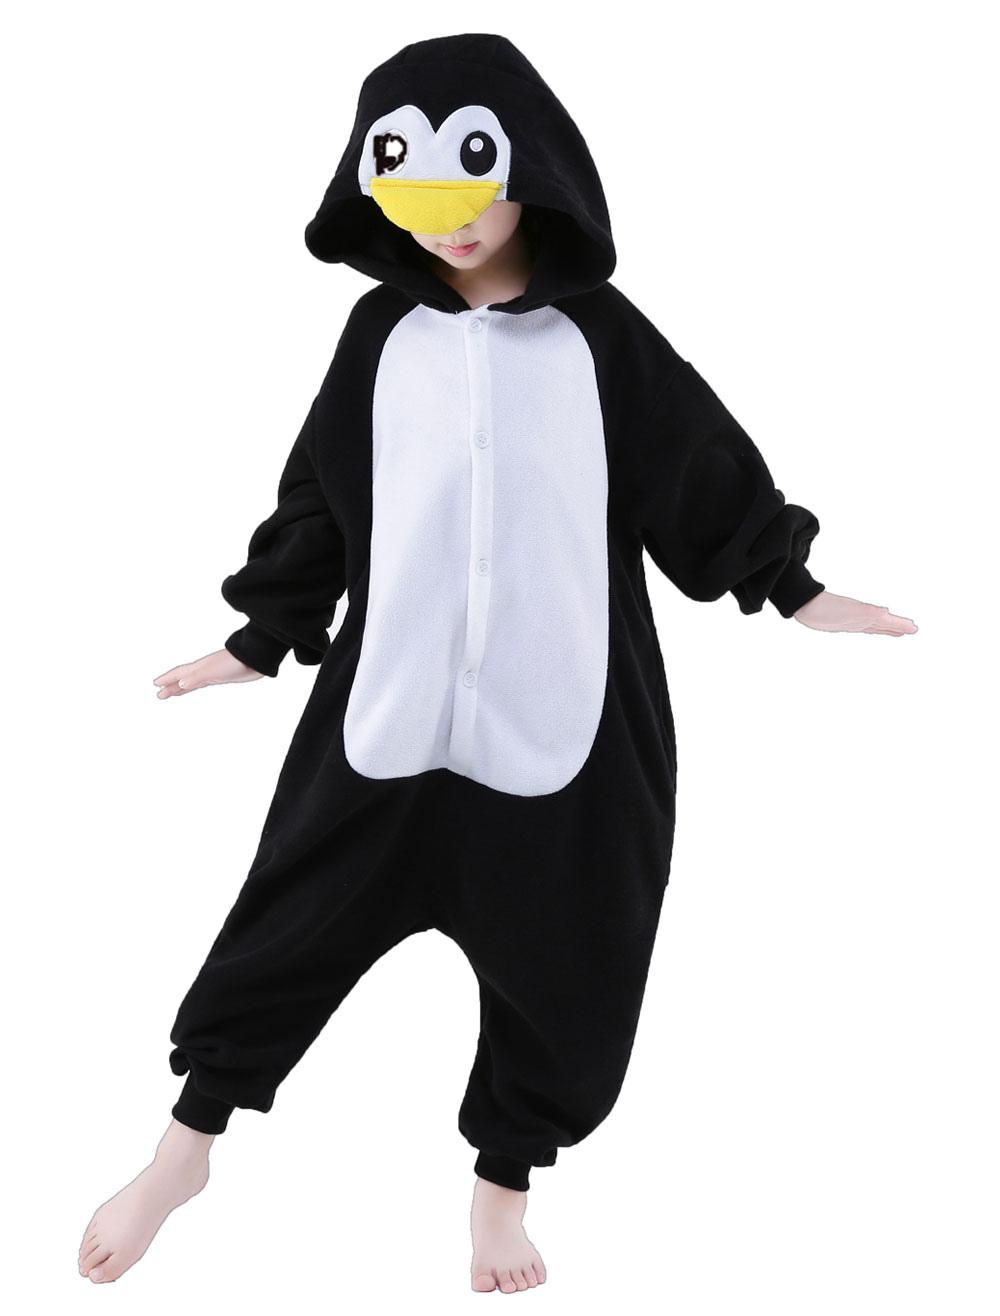 21ed24ad8 Preto Sleepwear Animal Onesie pinguim Kigurumi fantasia infantil Halloween  - Milanoo.com